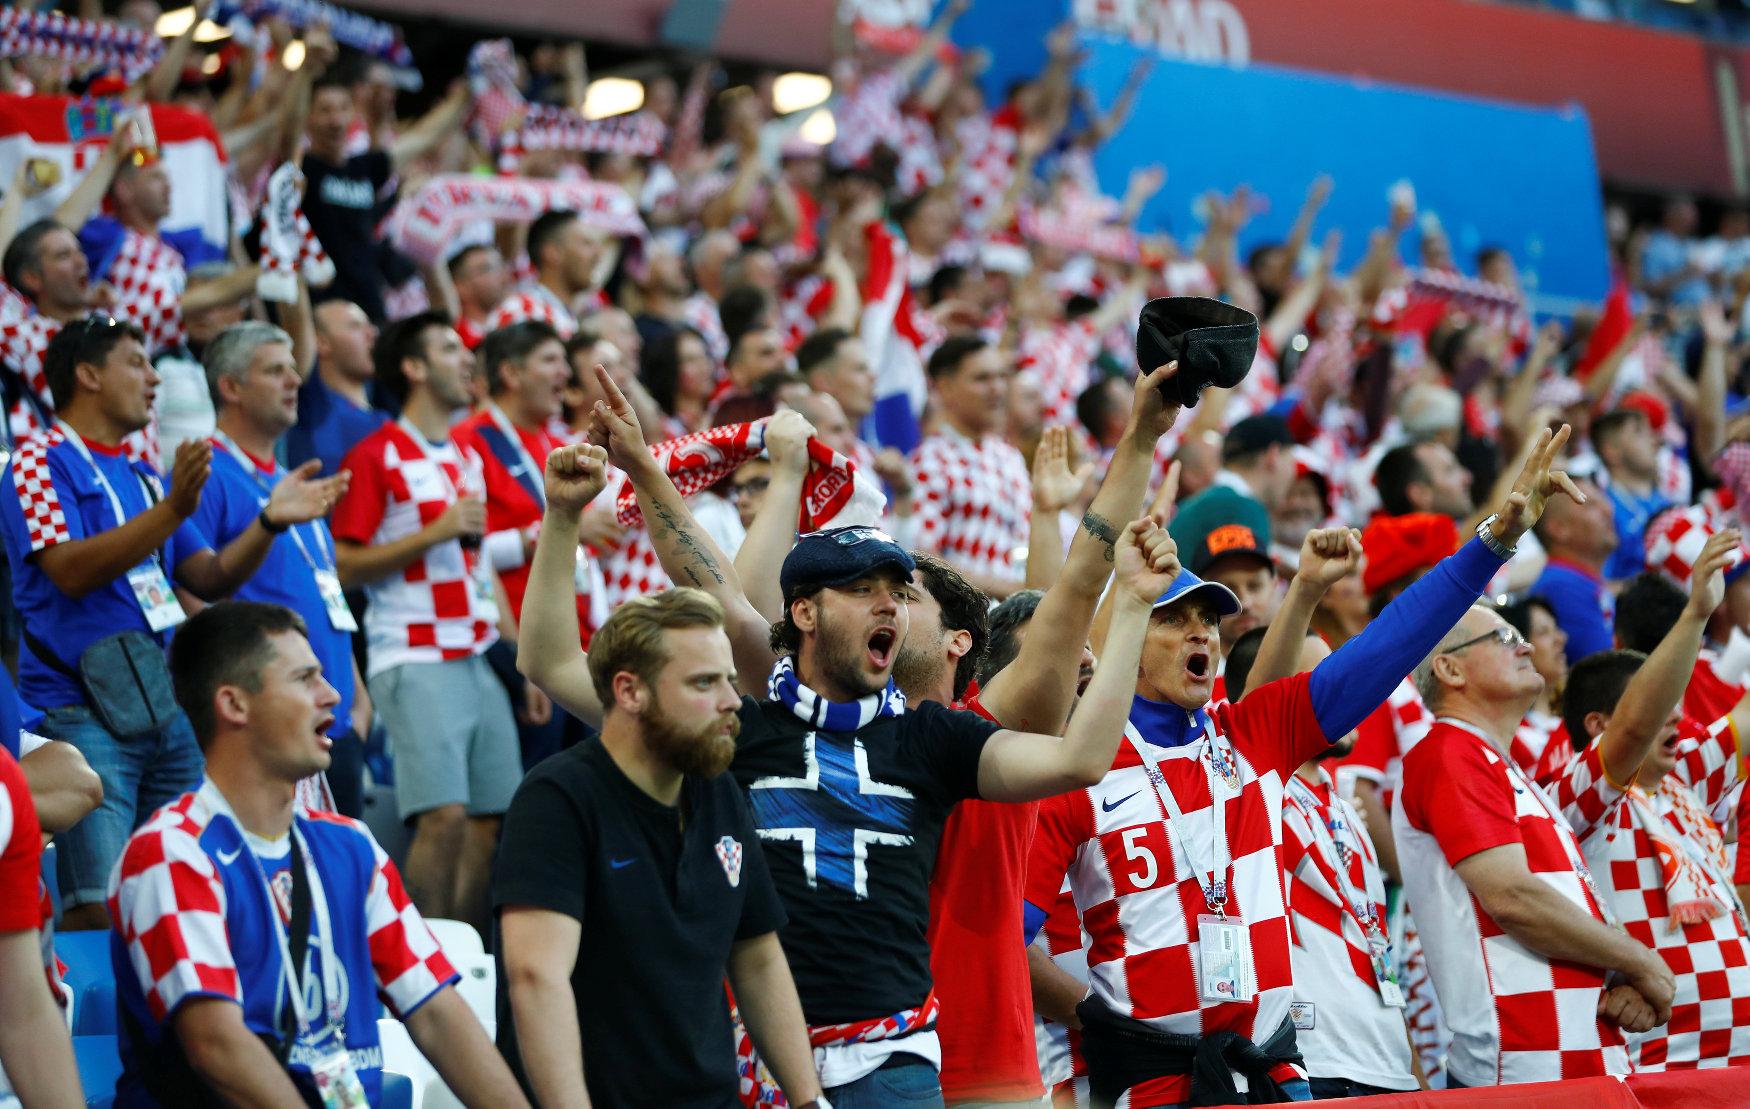 Soccer Football - World Cup - Group D - Croatia vs Nigeria - Kaliningrad Stadium, Kaliningrad, Russia - June 16, 2018   Croatia fans inside the stadium before the match    REUTERS/Fabrizio Bensch